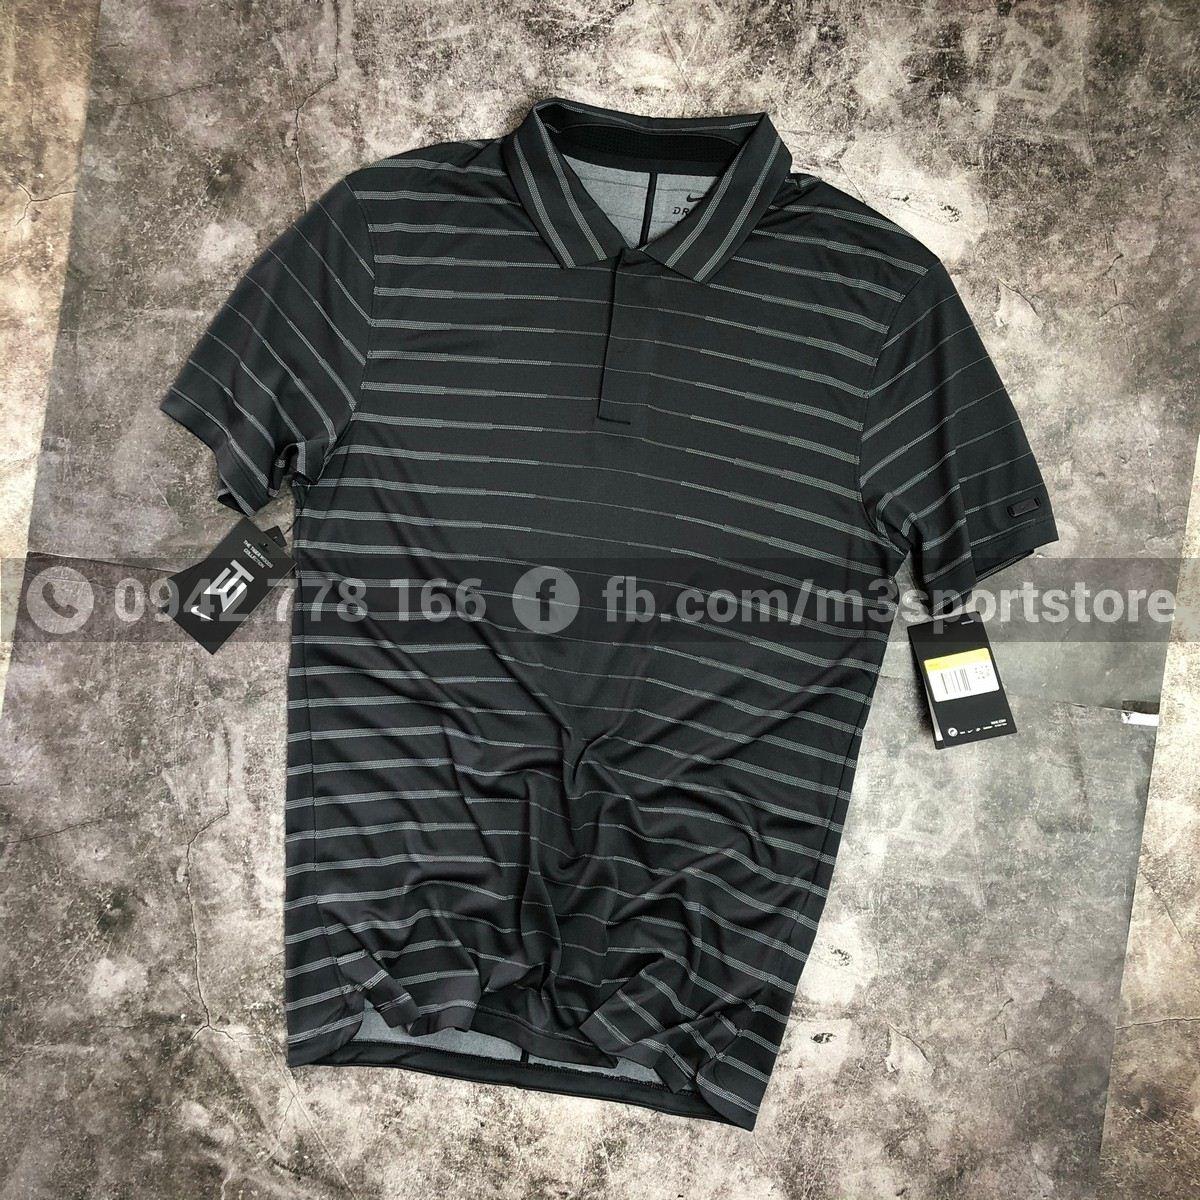 Áo thể thao nam Nike Golf Polo Dri-Fit Tiger Woods BV0351